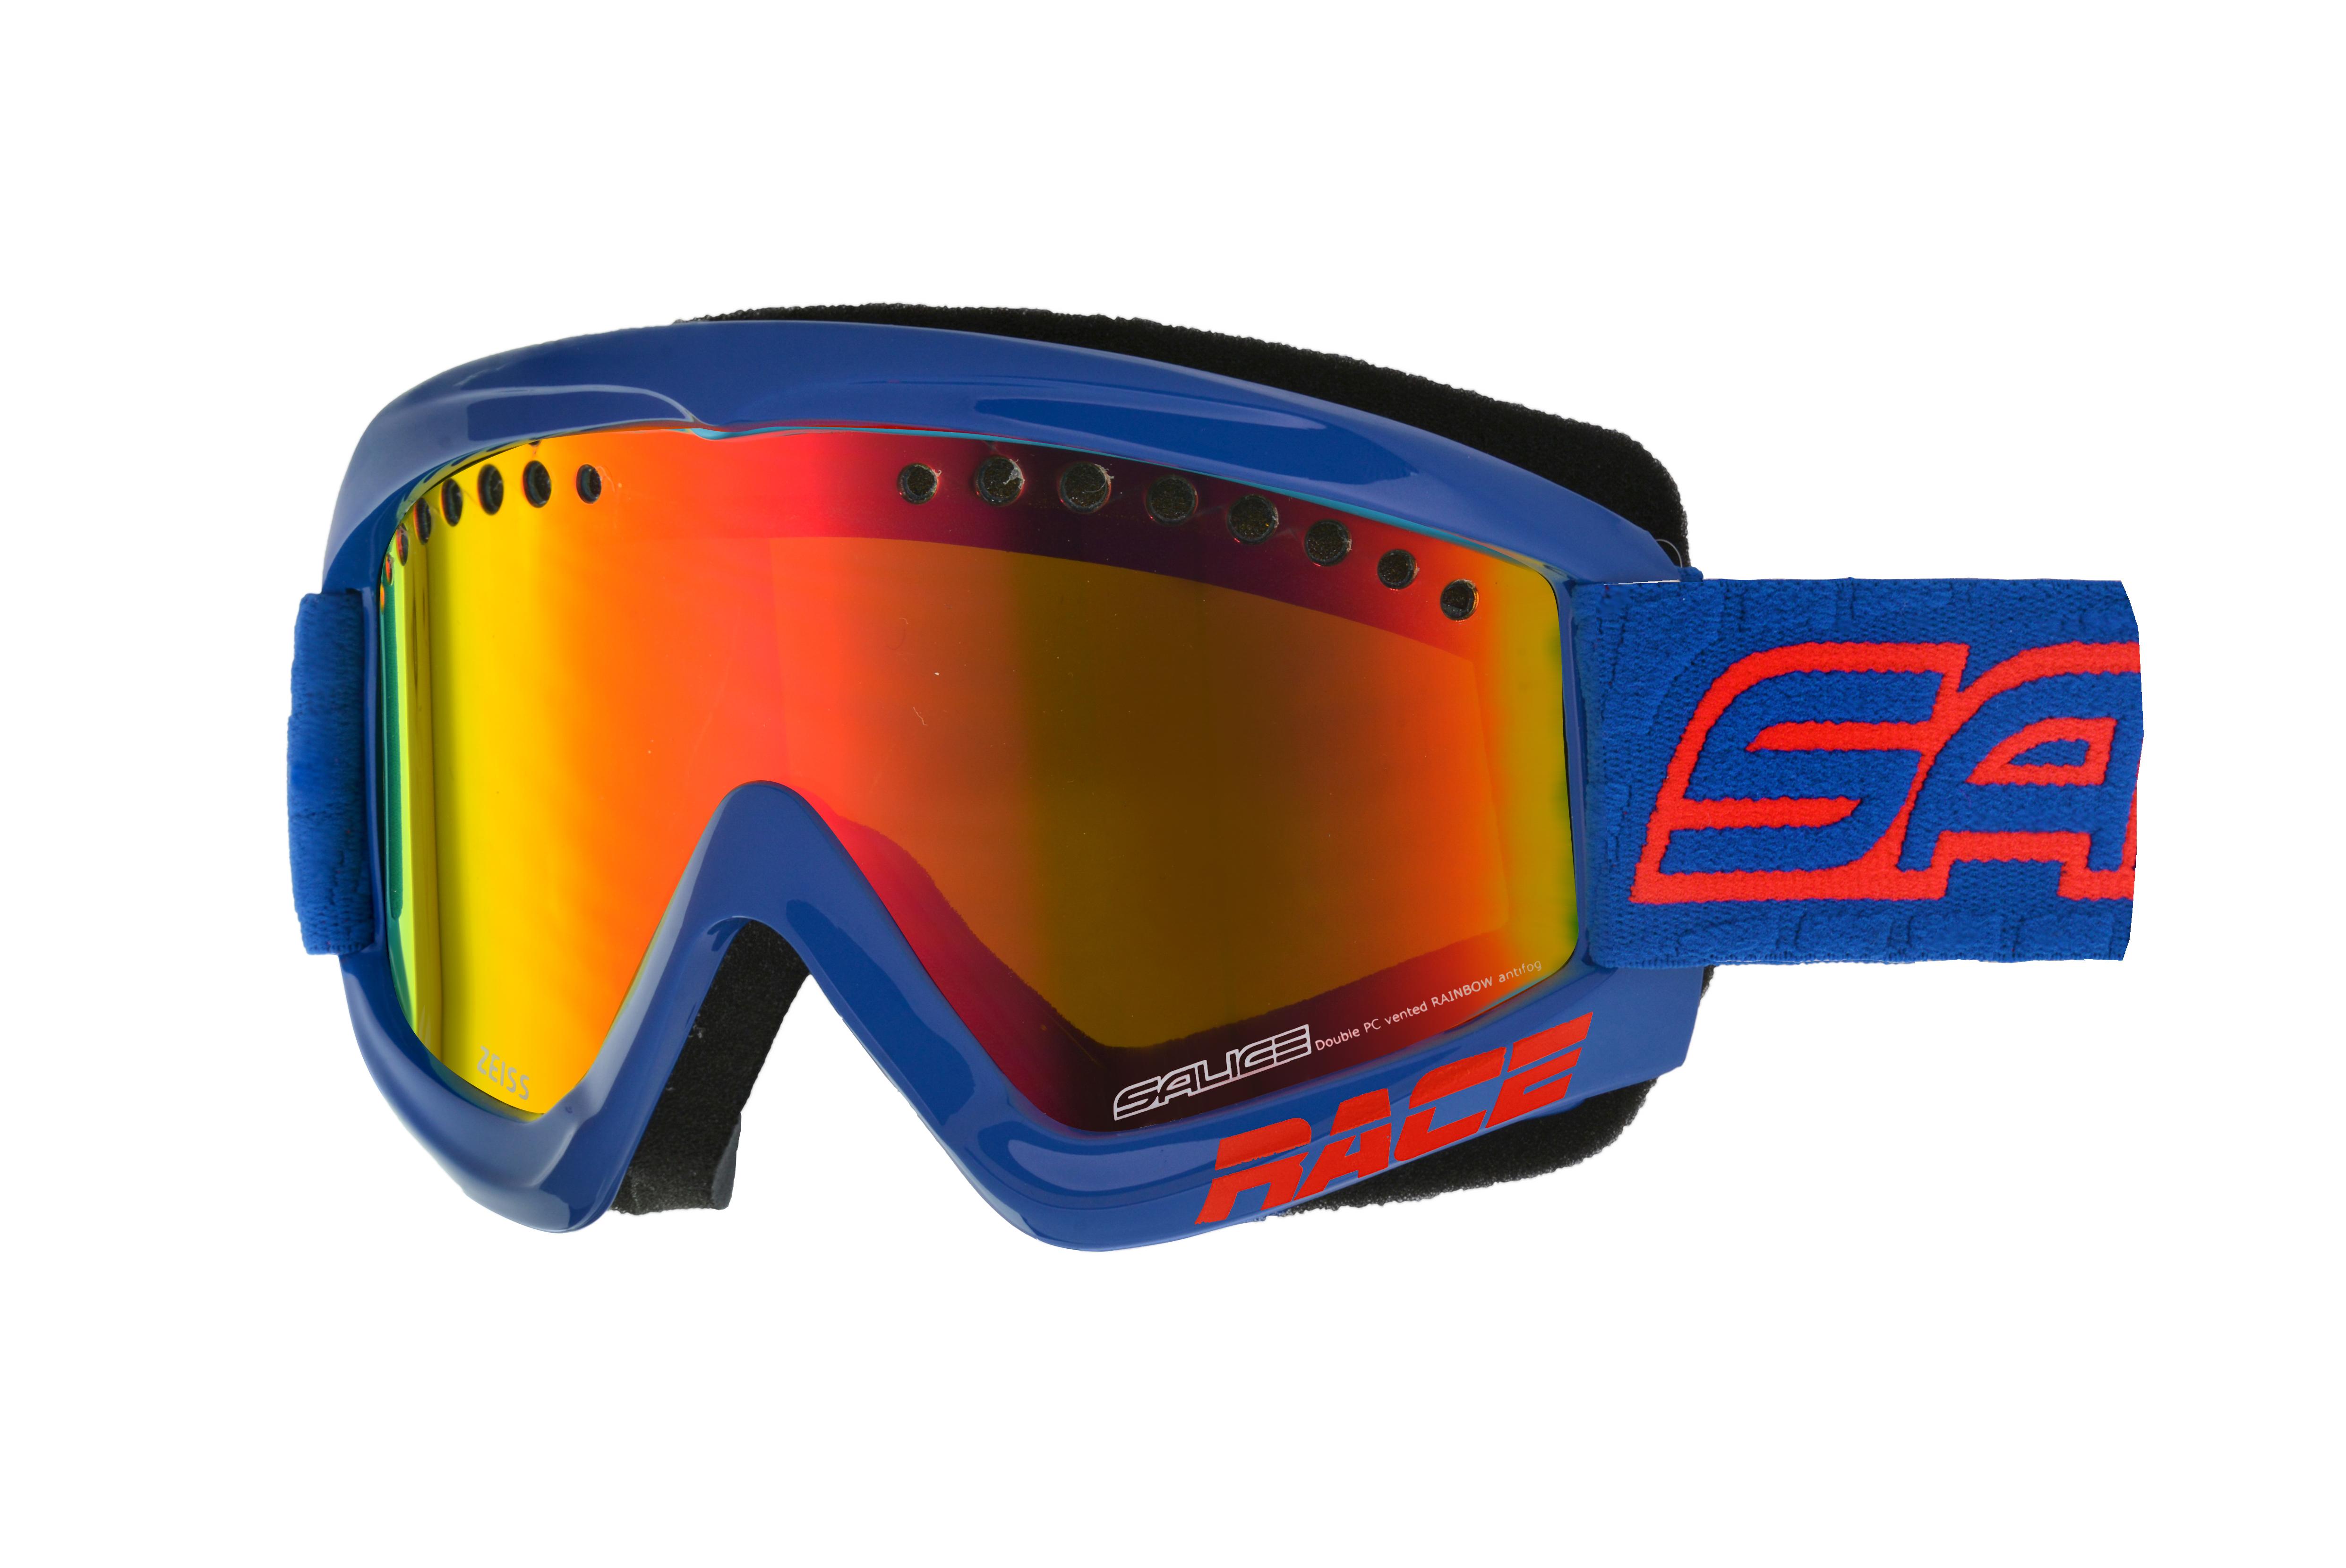 Очки горнолыжные Salice 2016-17 969DAFV BLUE/BROWN